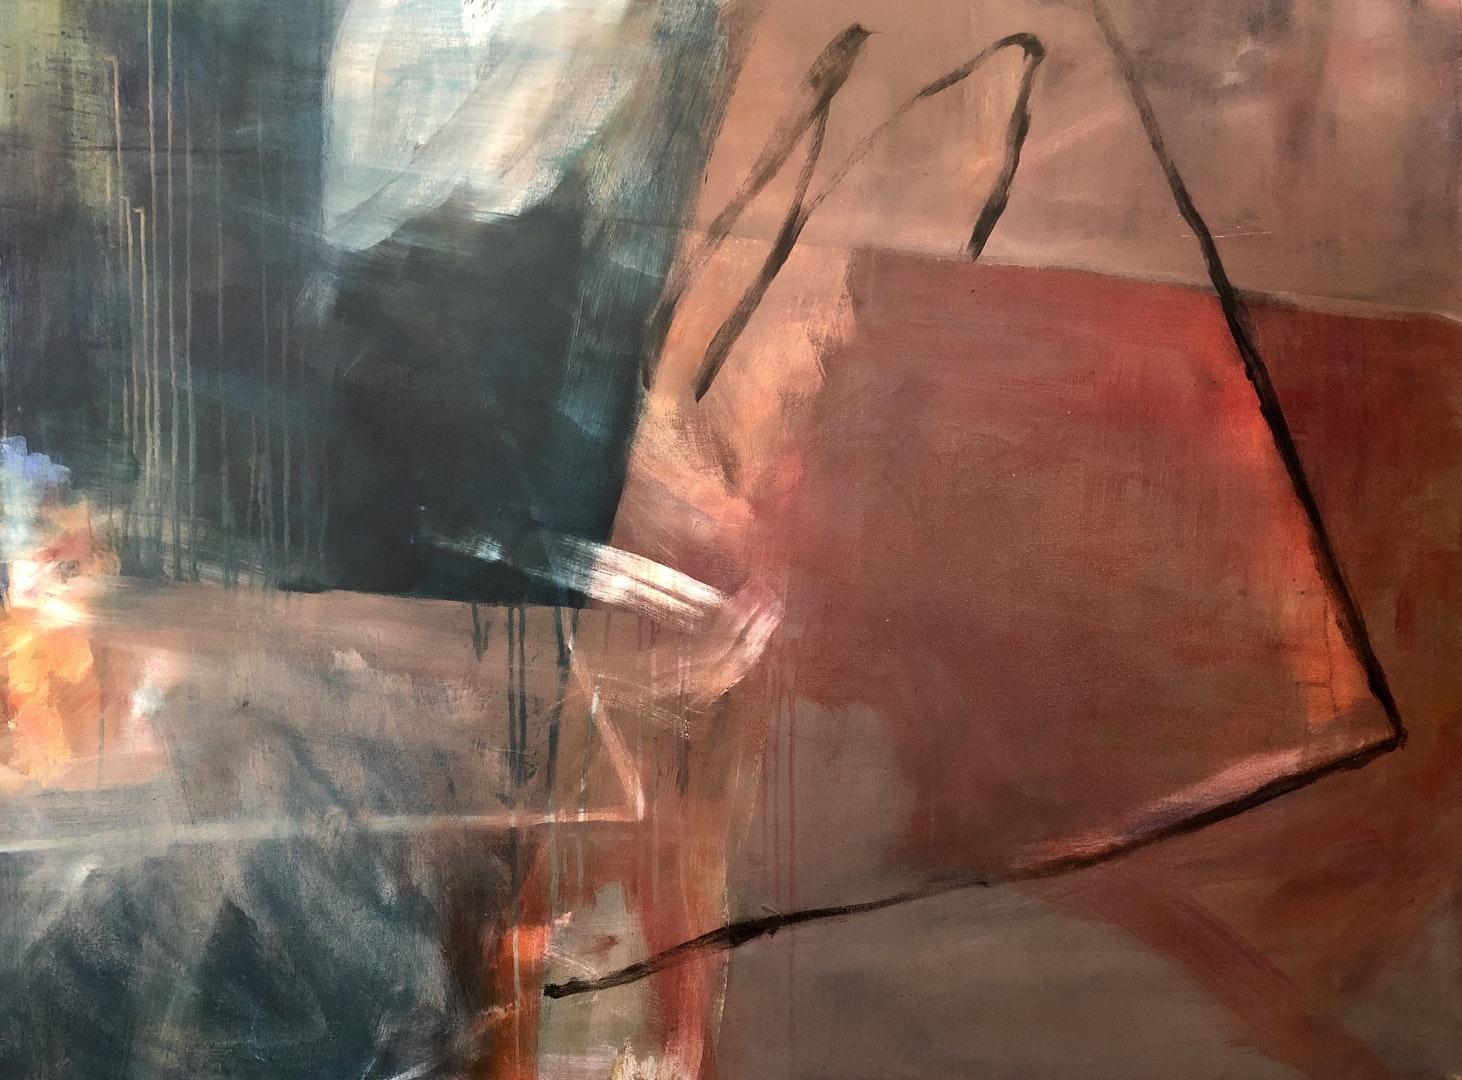 'The Wall (Absent) II', Priya Vadhyar, Acrylic on canvas, 91 x 122 cm